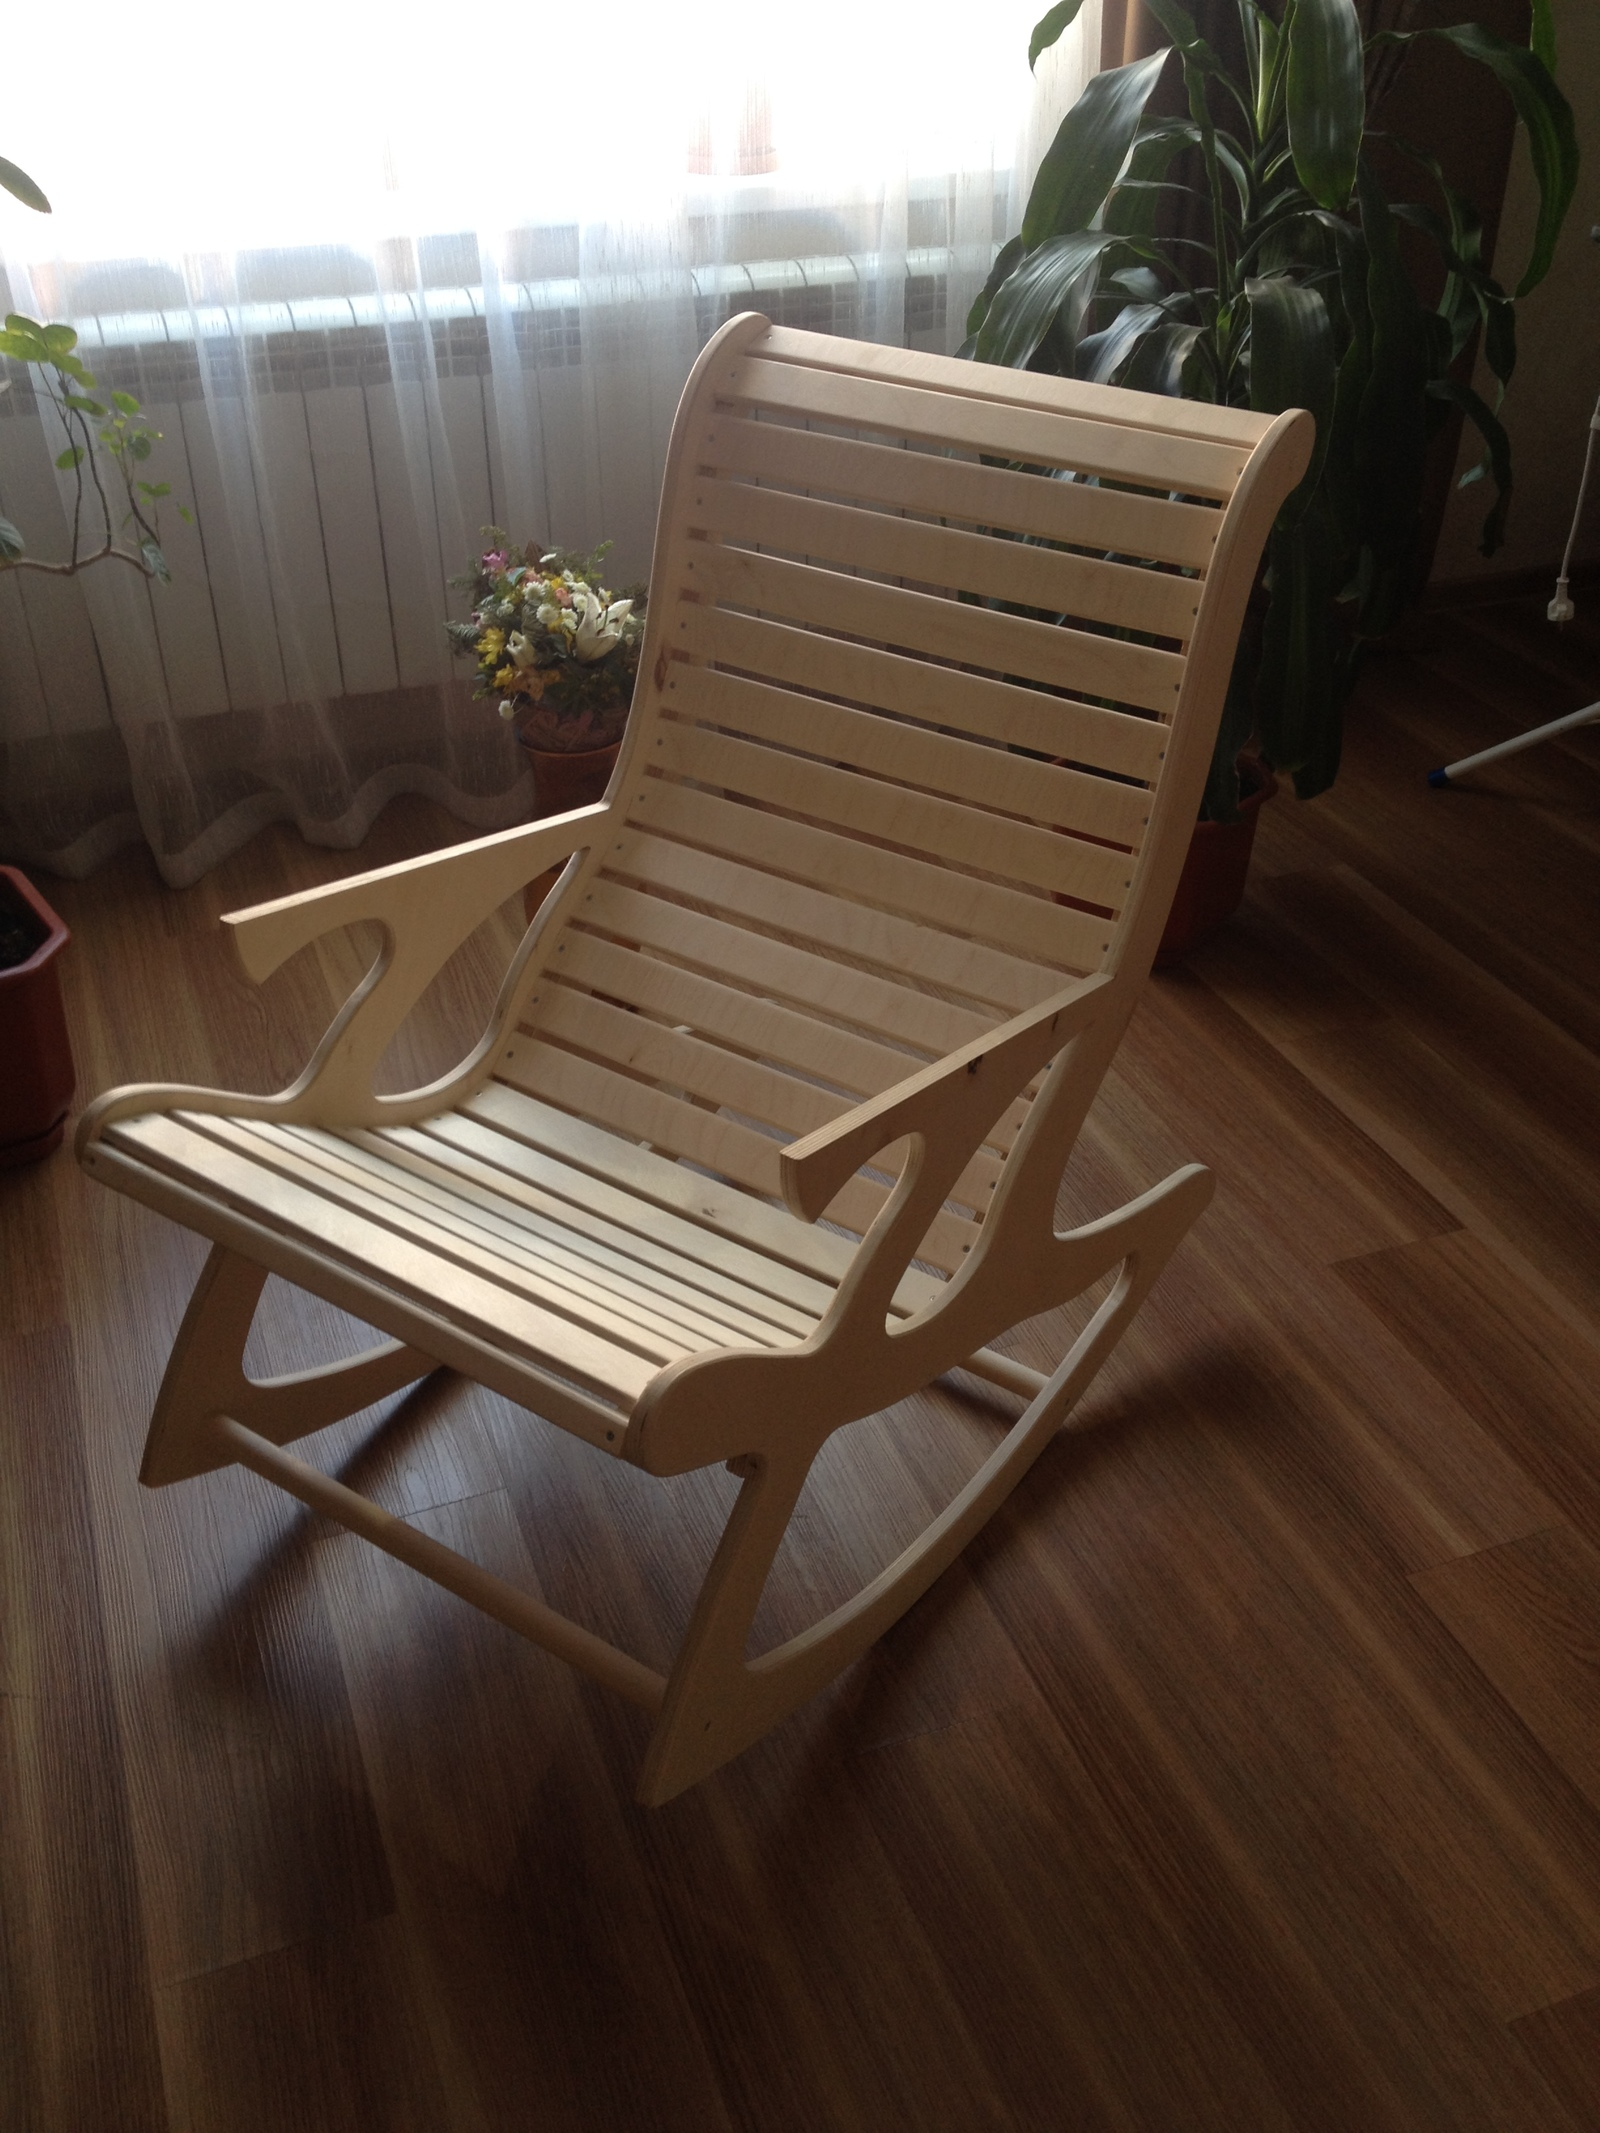 Кресло-качалка глайдер своими руками чертежи фото 98